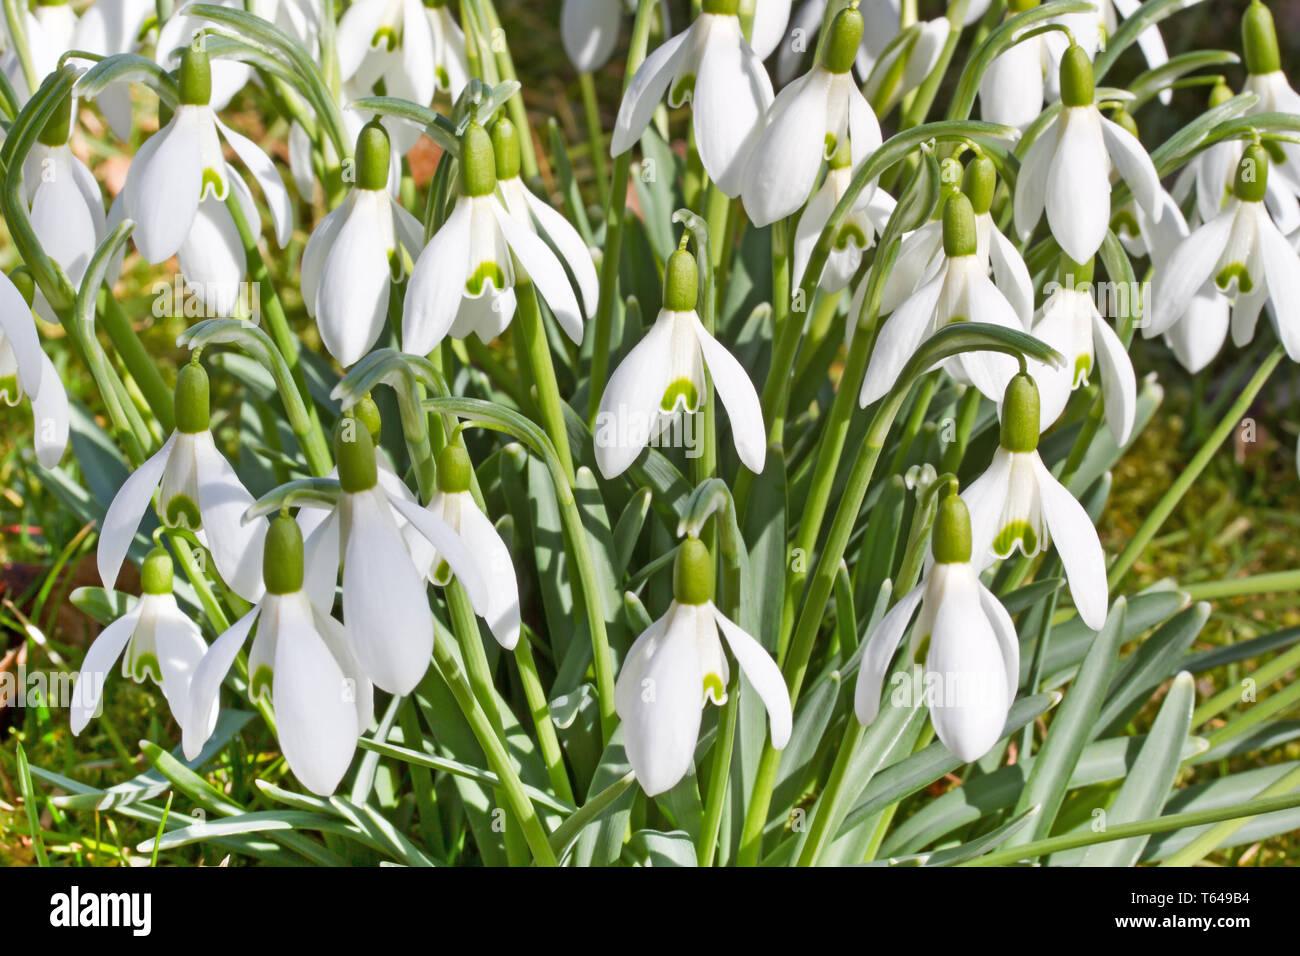 snowdrop flowers, genus Galanthus - Stock Image